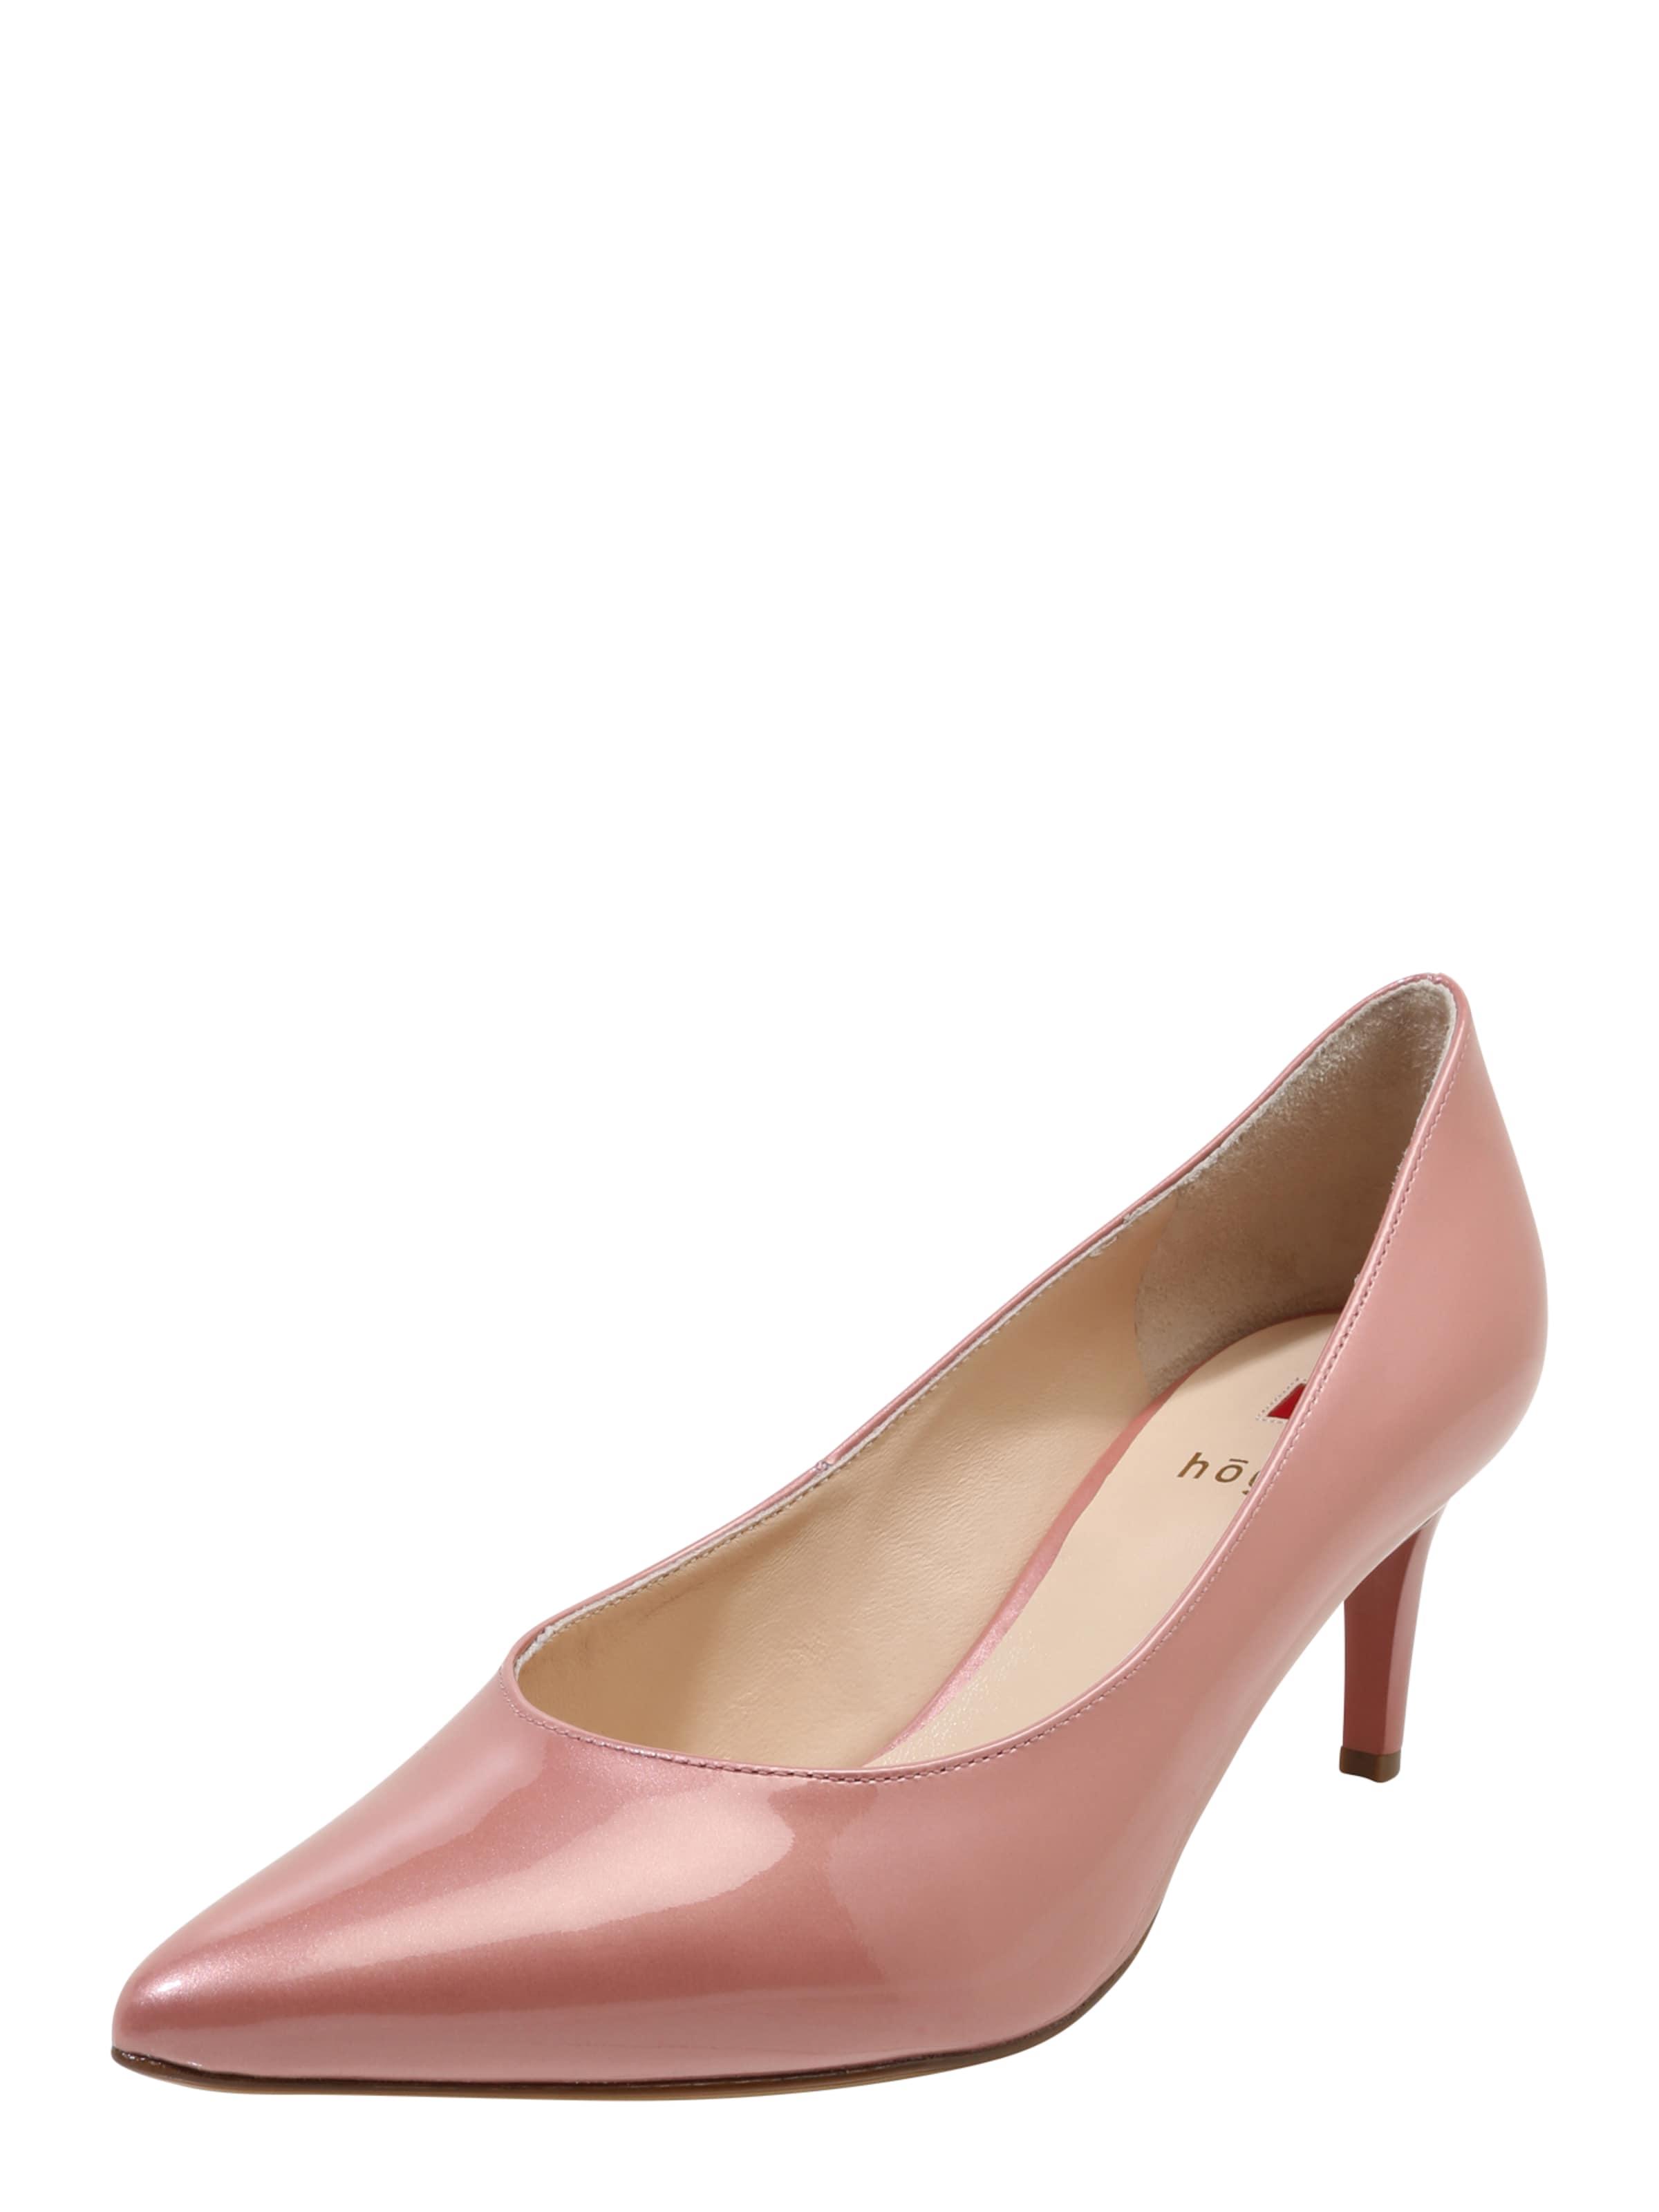 Högl Pumps aus Lackleder Verschleißfeste billige Schuhe